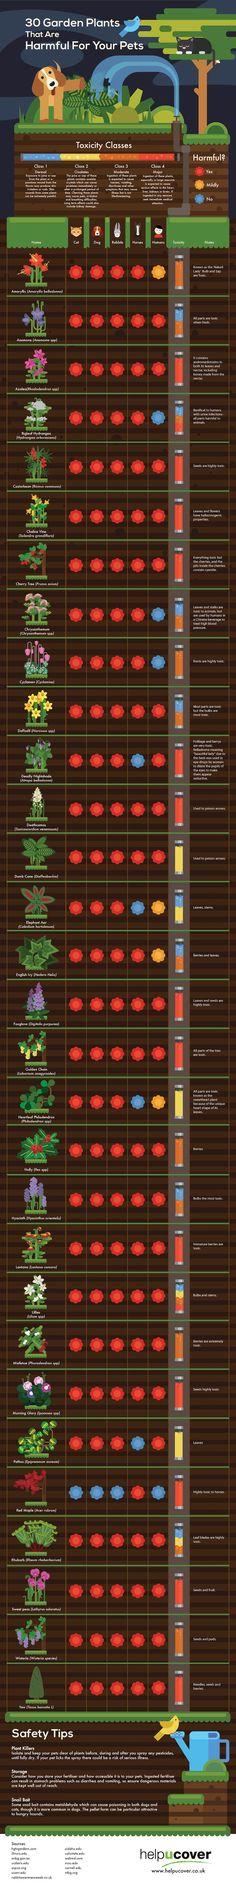 30 garden plants harmful for pets